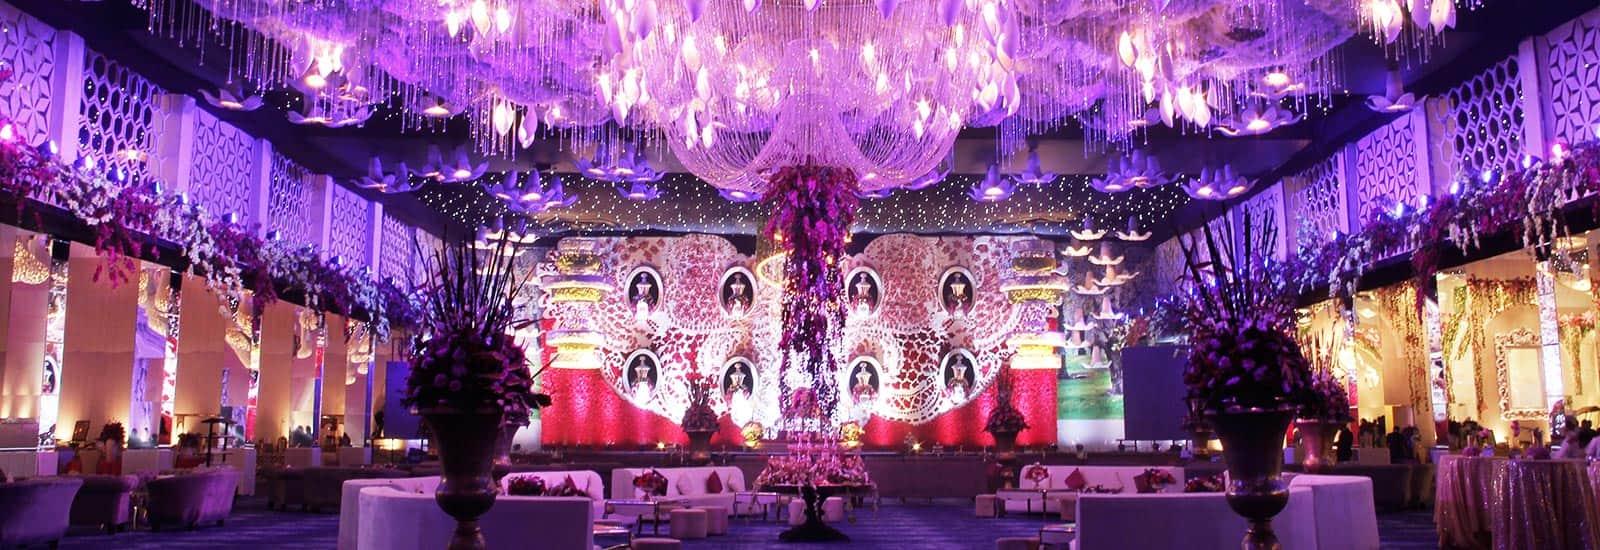 the ritz banquet halls stage image